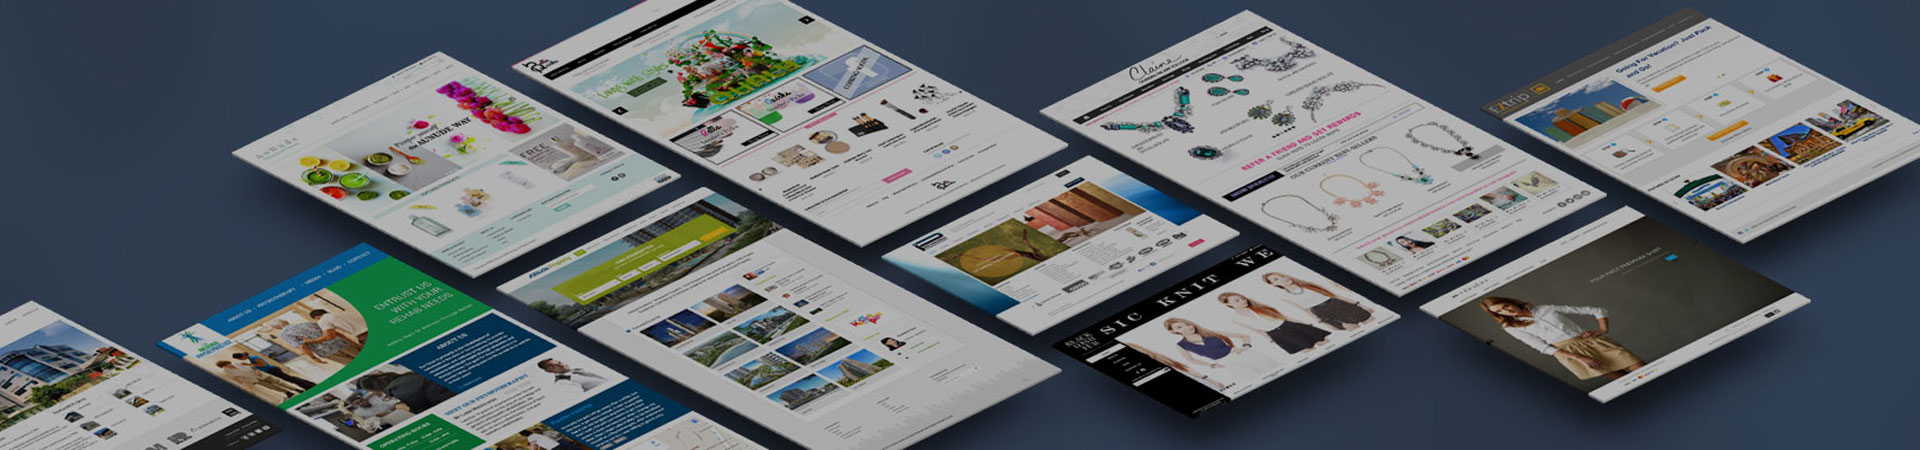 Website Design Singapore - ZanSociety